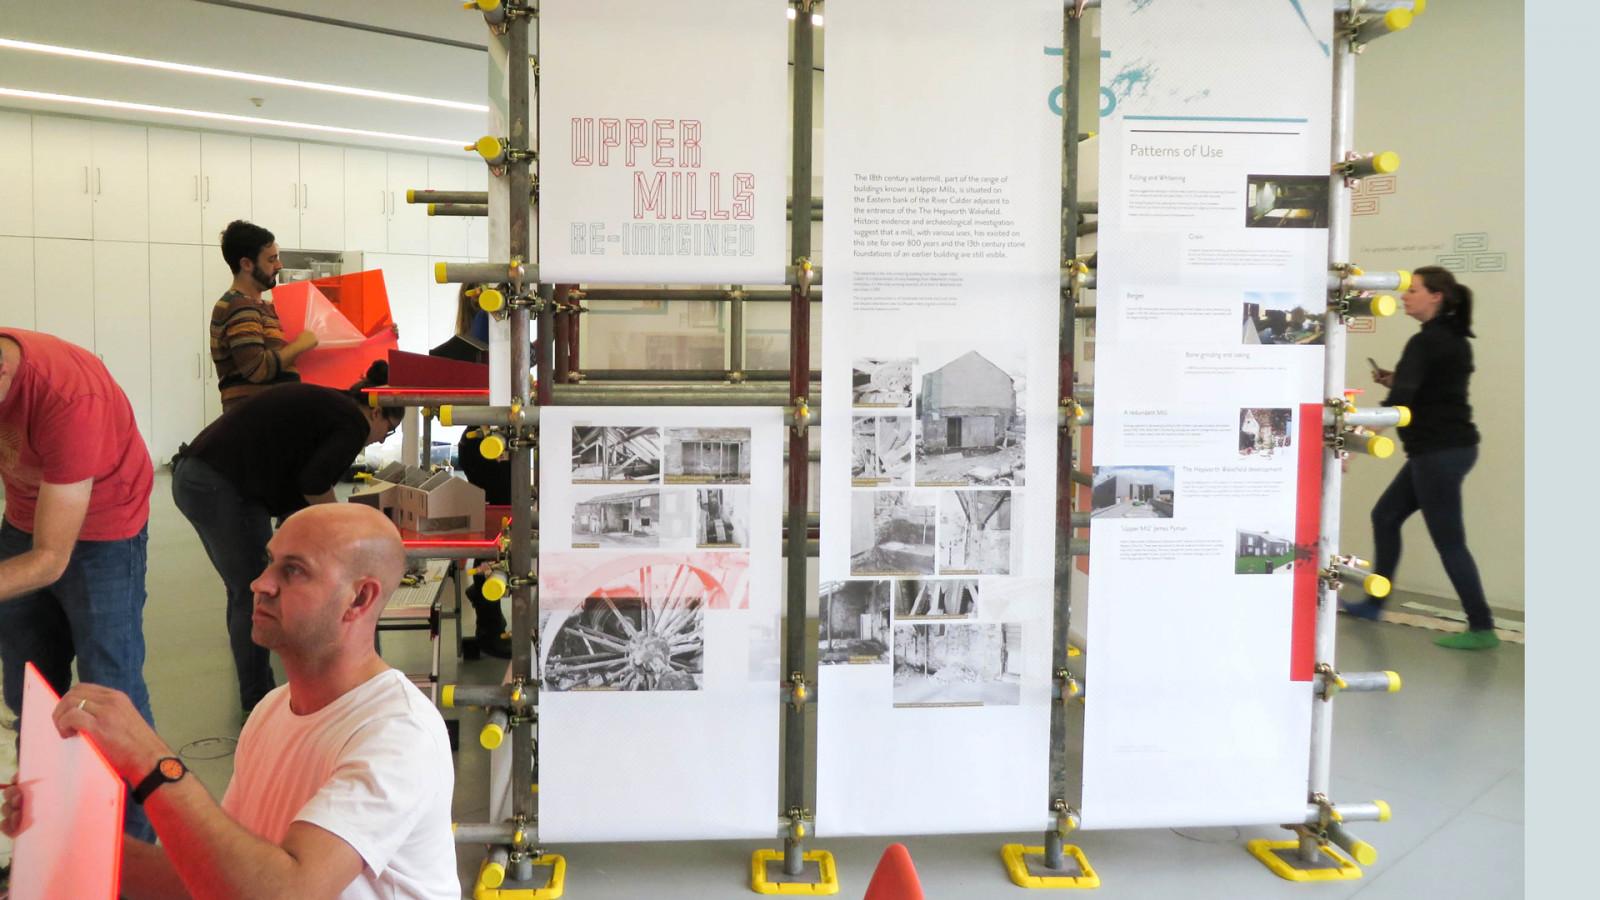 Upper Mills Project- Hepworth Gallery, Wakefield -  image for The Hepworth Gallery  project